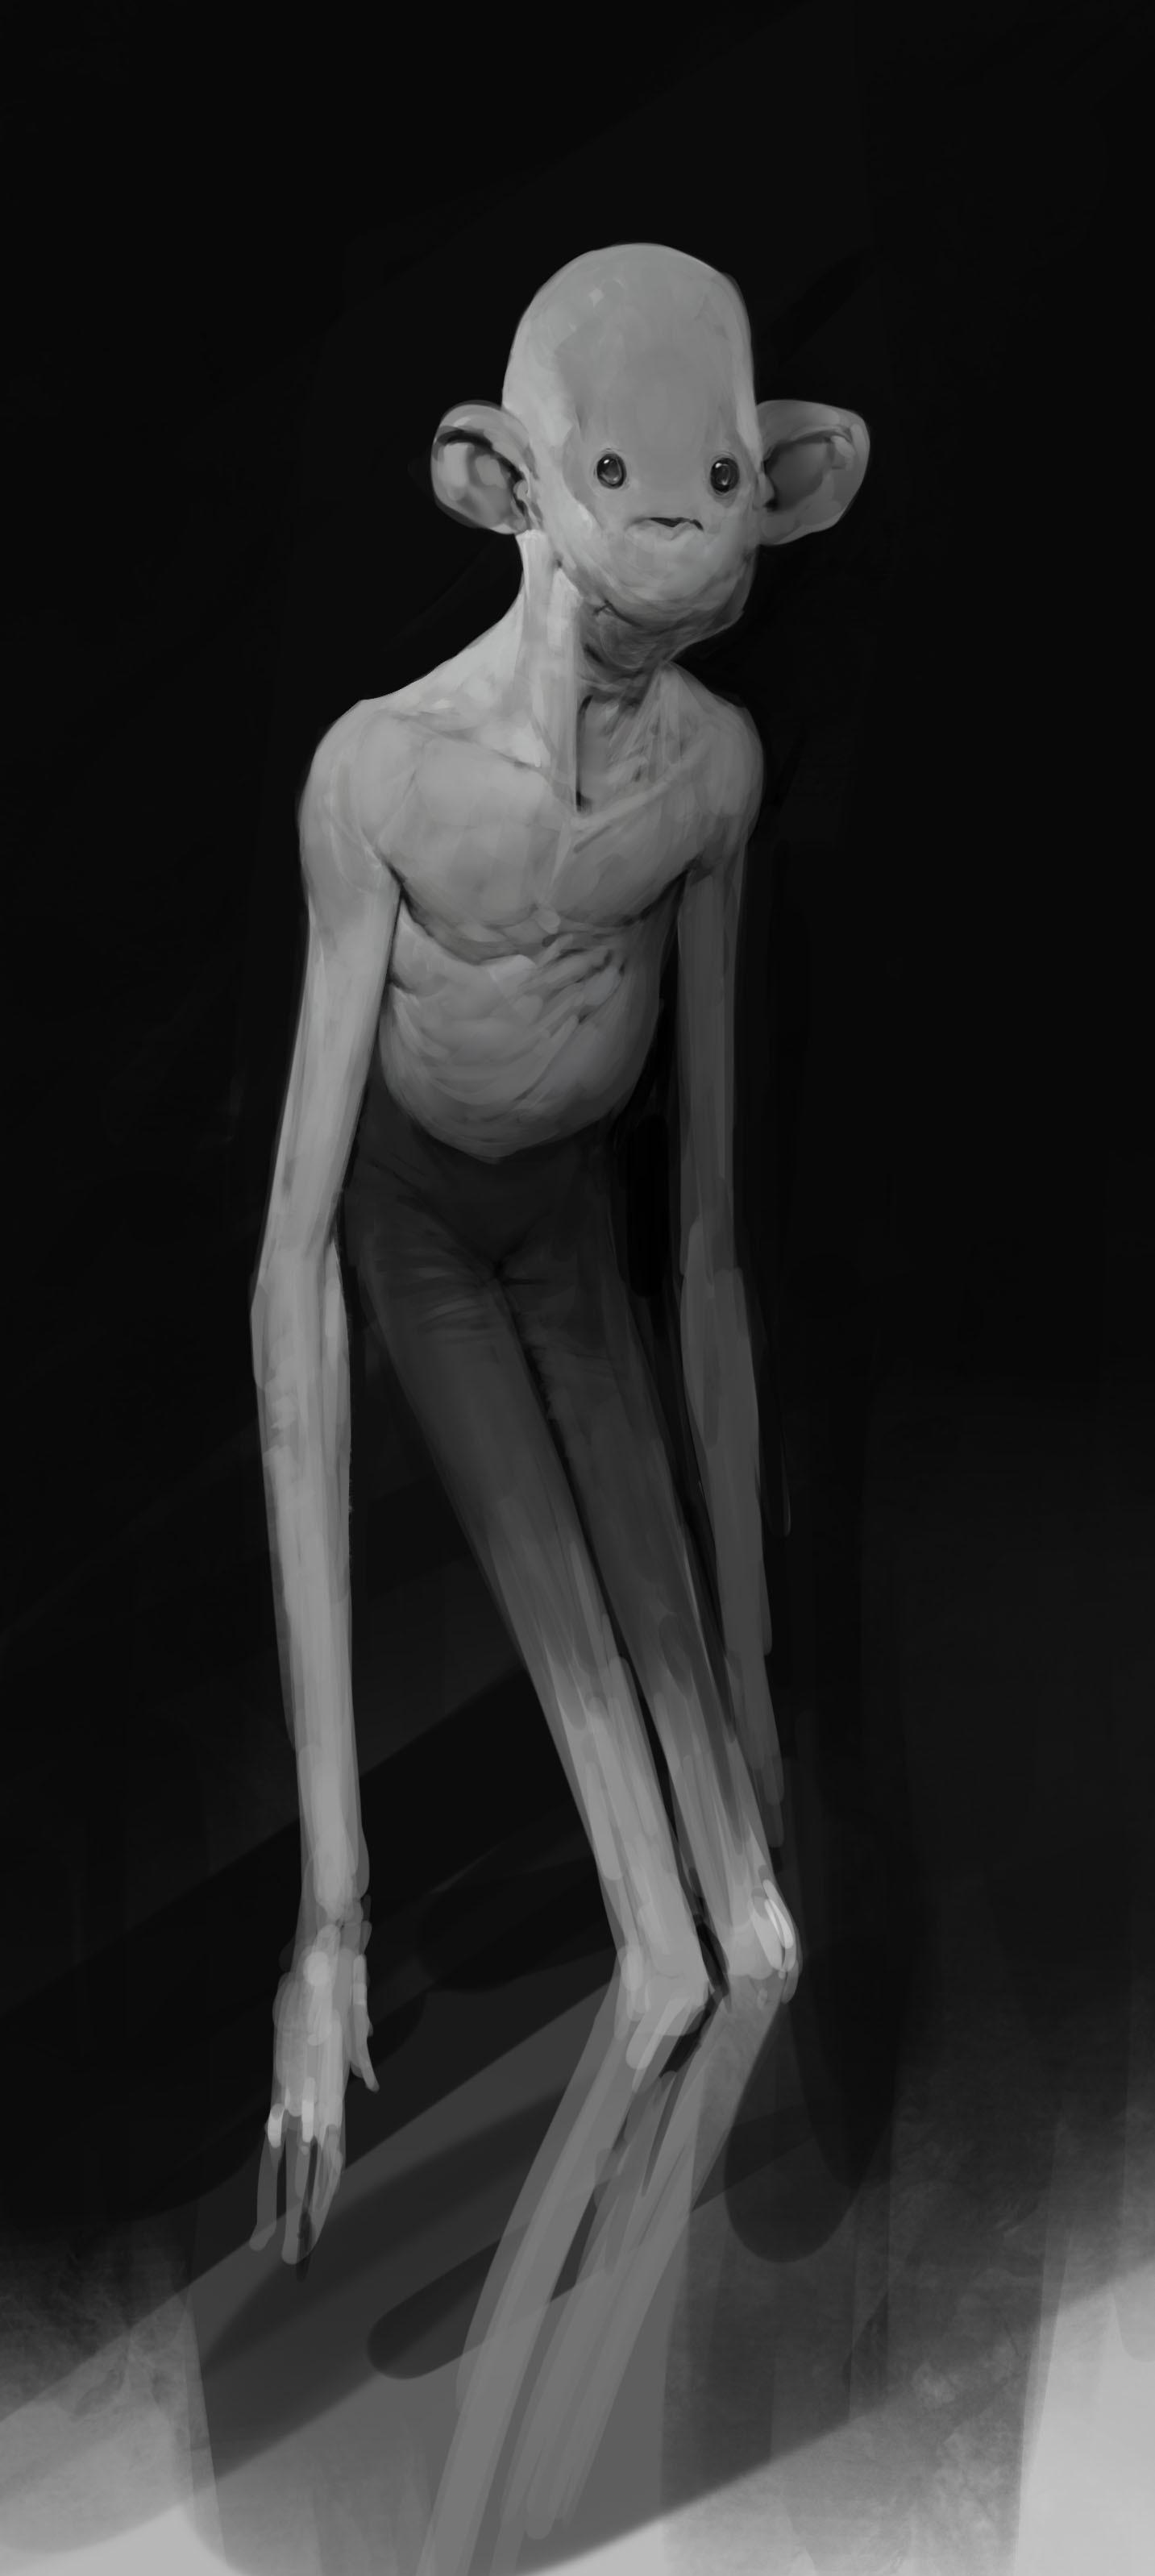 ArtStation - Long arms skinny legs. , Anthony Jones